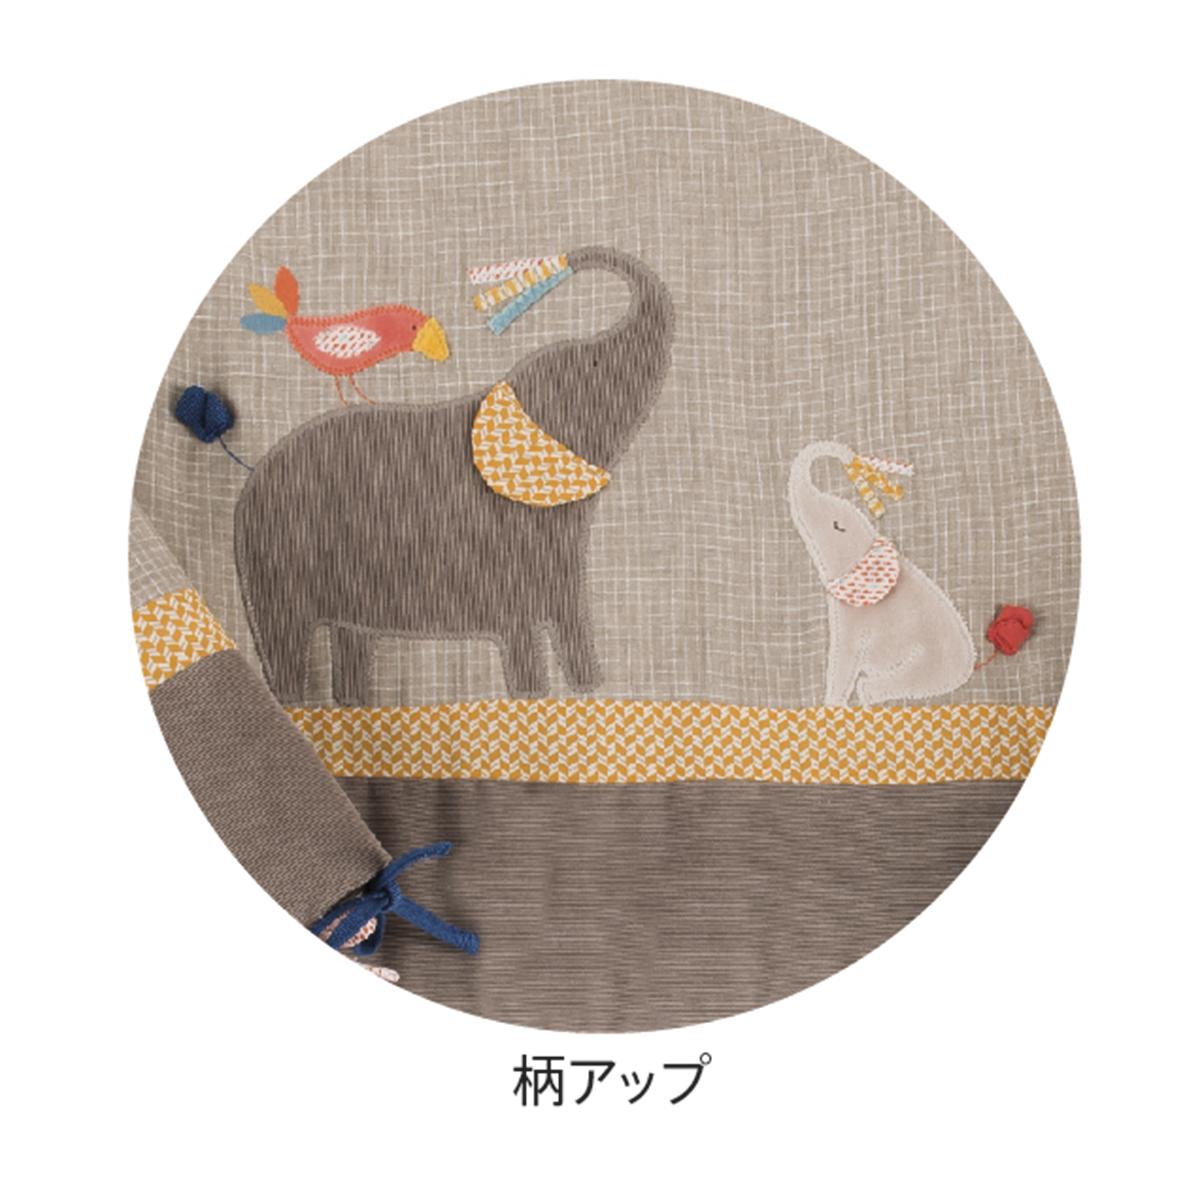 【50%OFF】「パーポム」ベッドサイドパネル